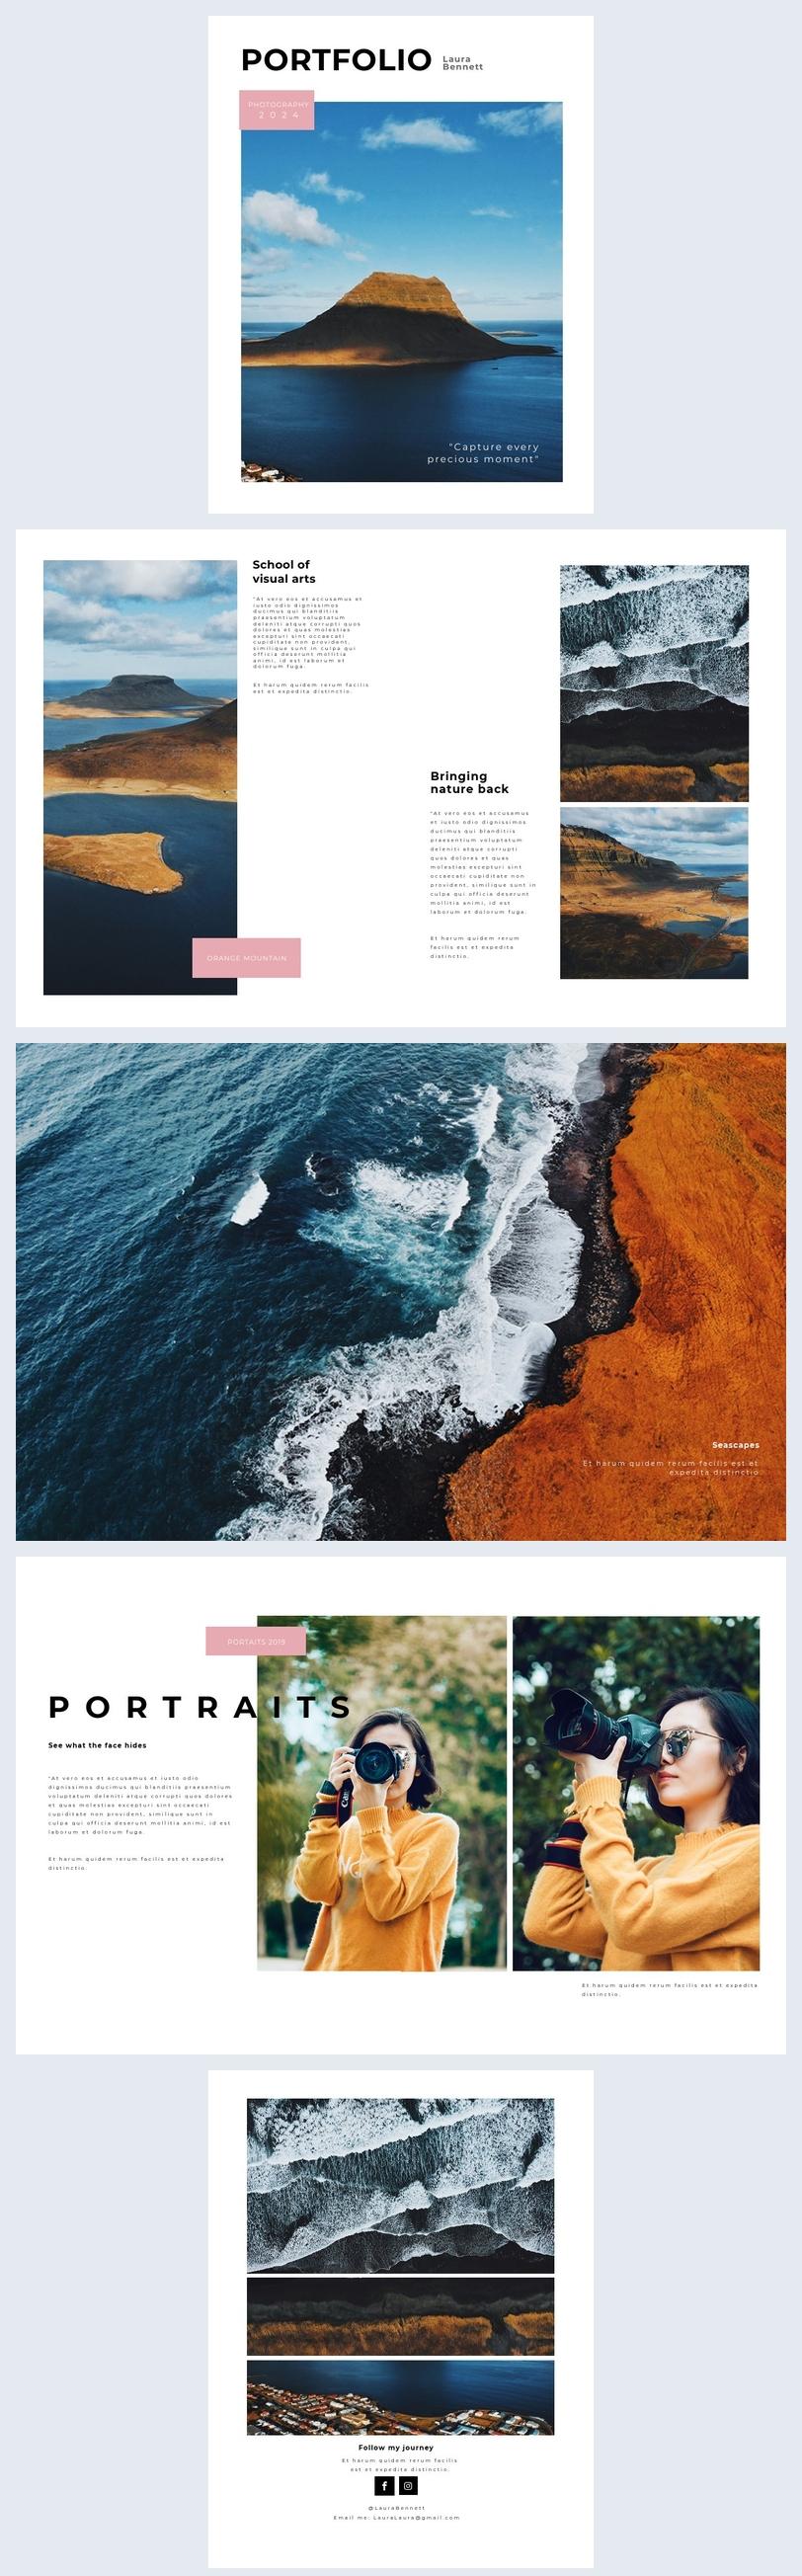 Photography Portfolio Design